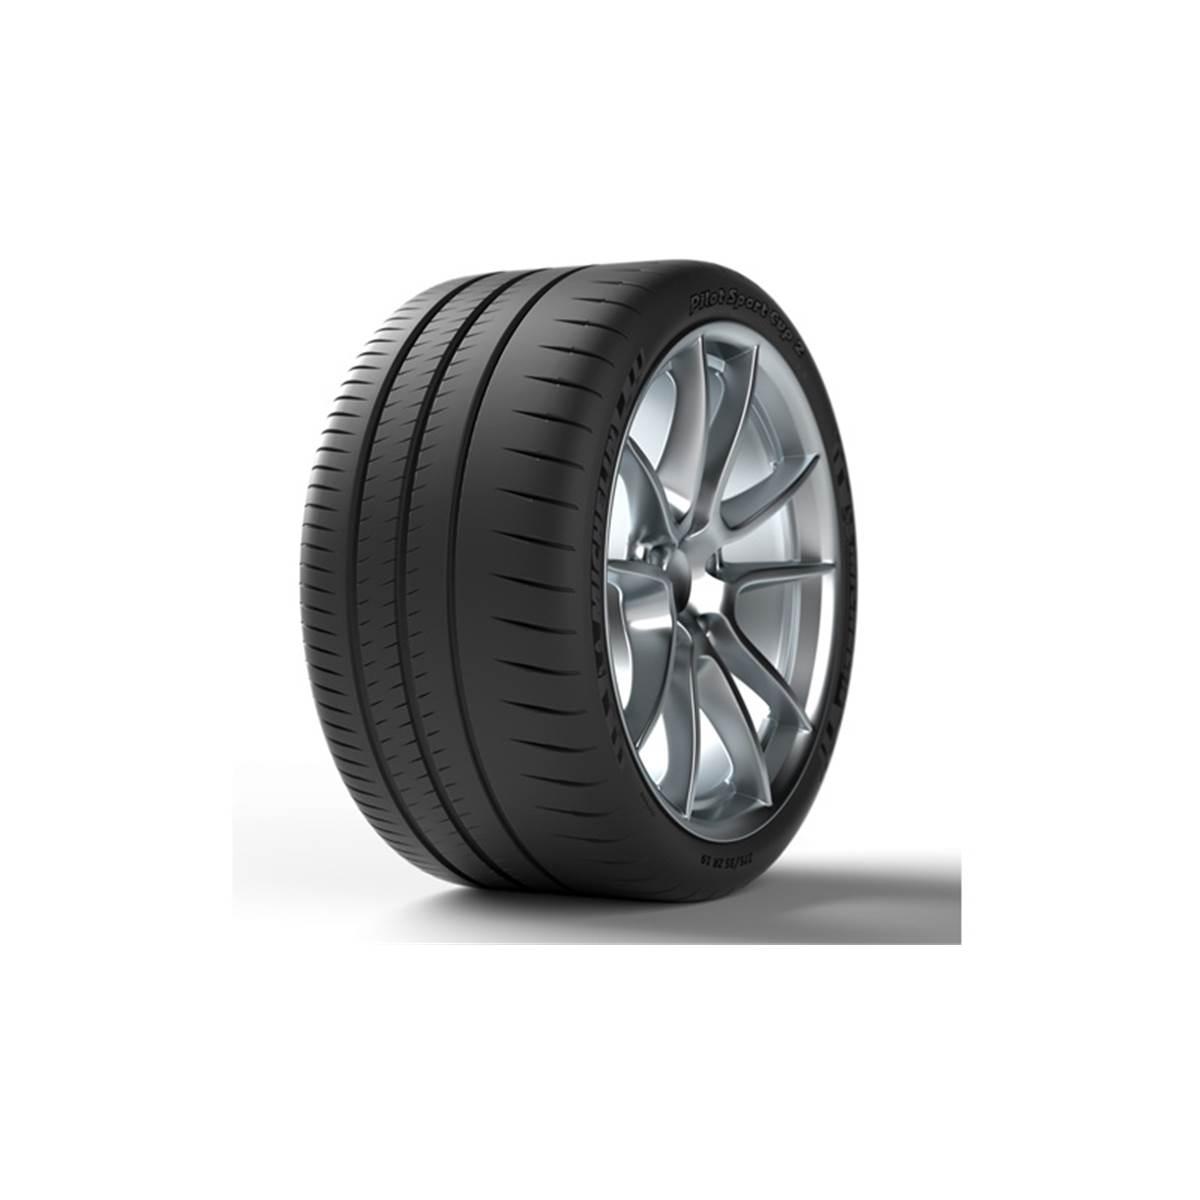 Pneu Michelin 265/40R19 102Y Pilot Sport Cup 2 XL